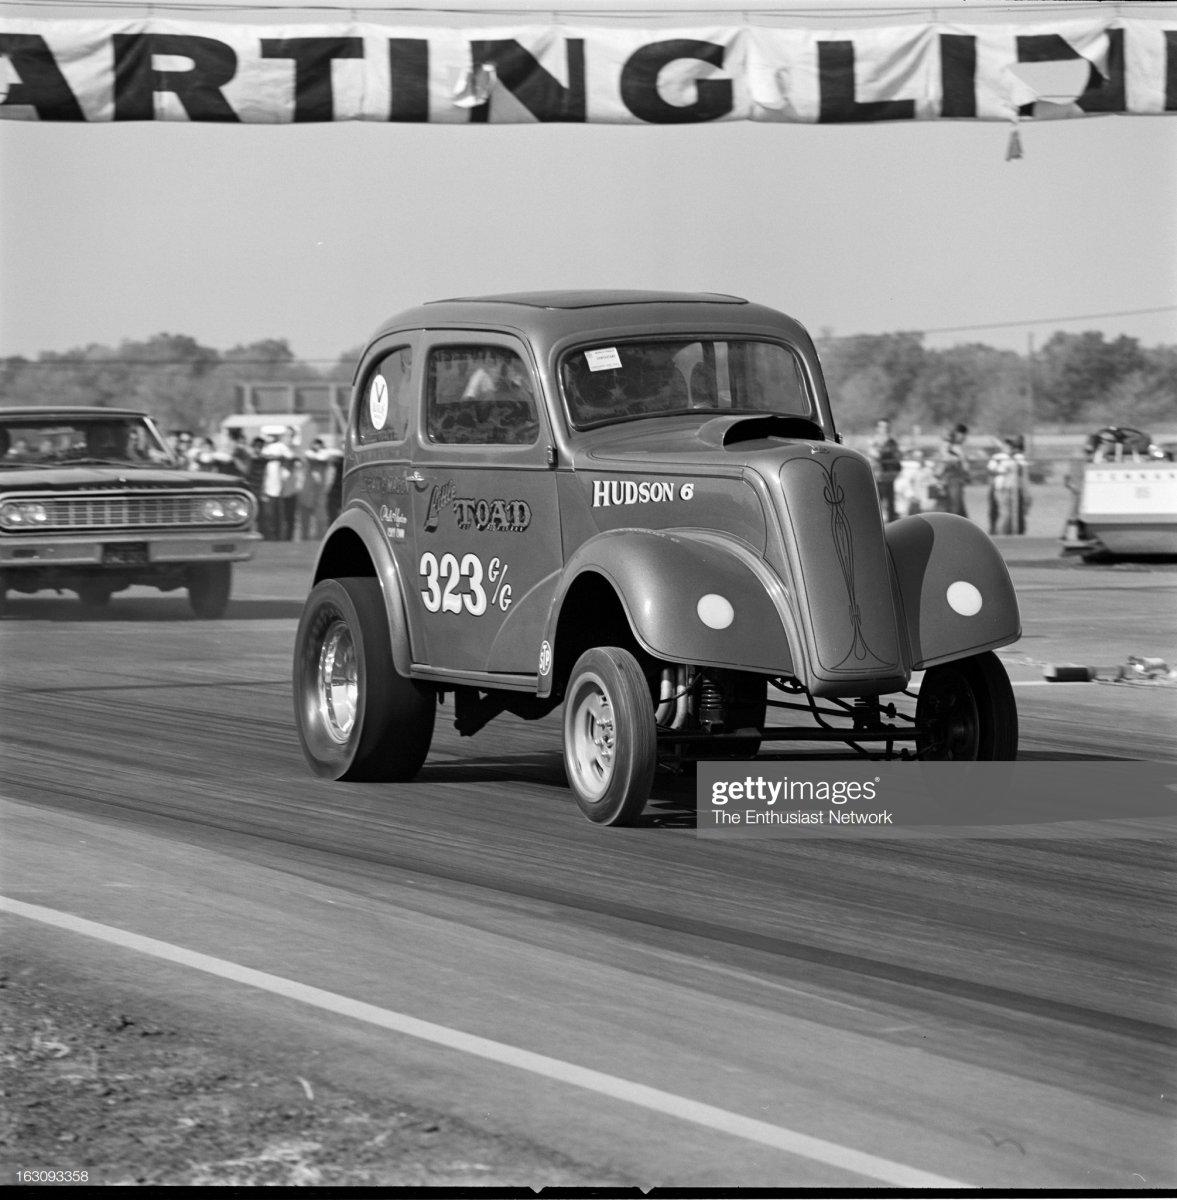 little toad 1965 NHRA World Championshi.jpg